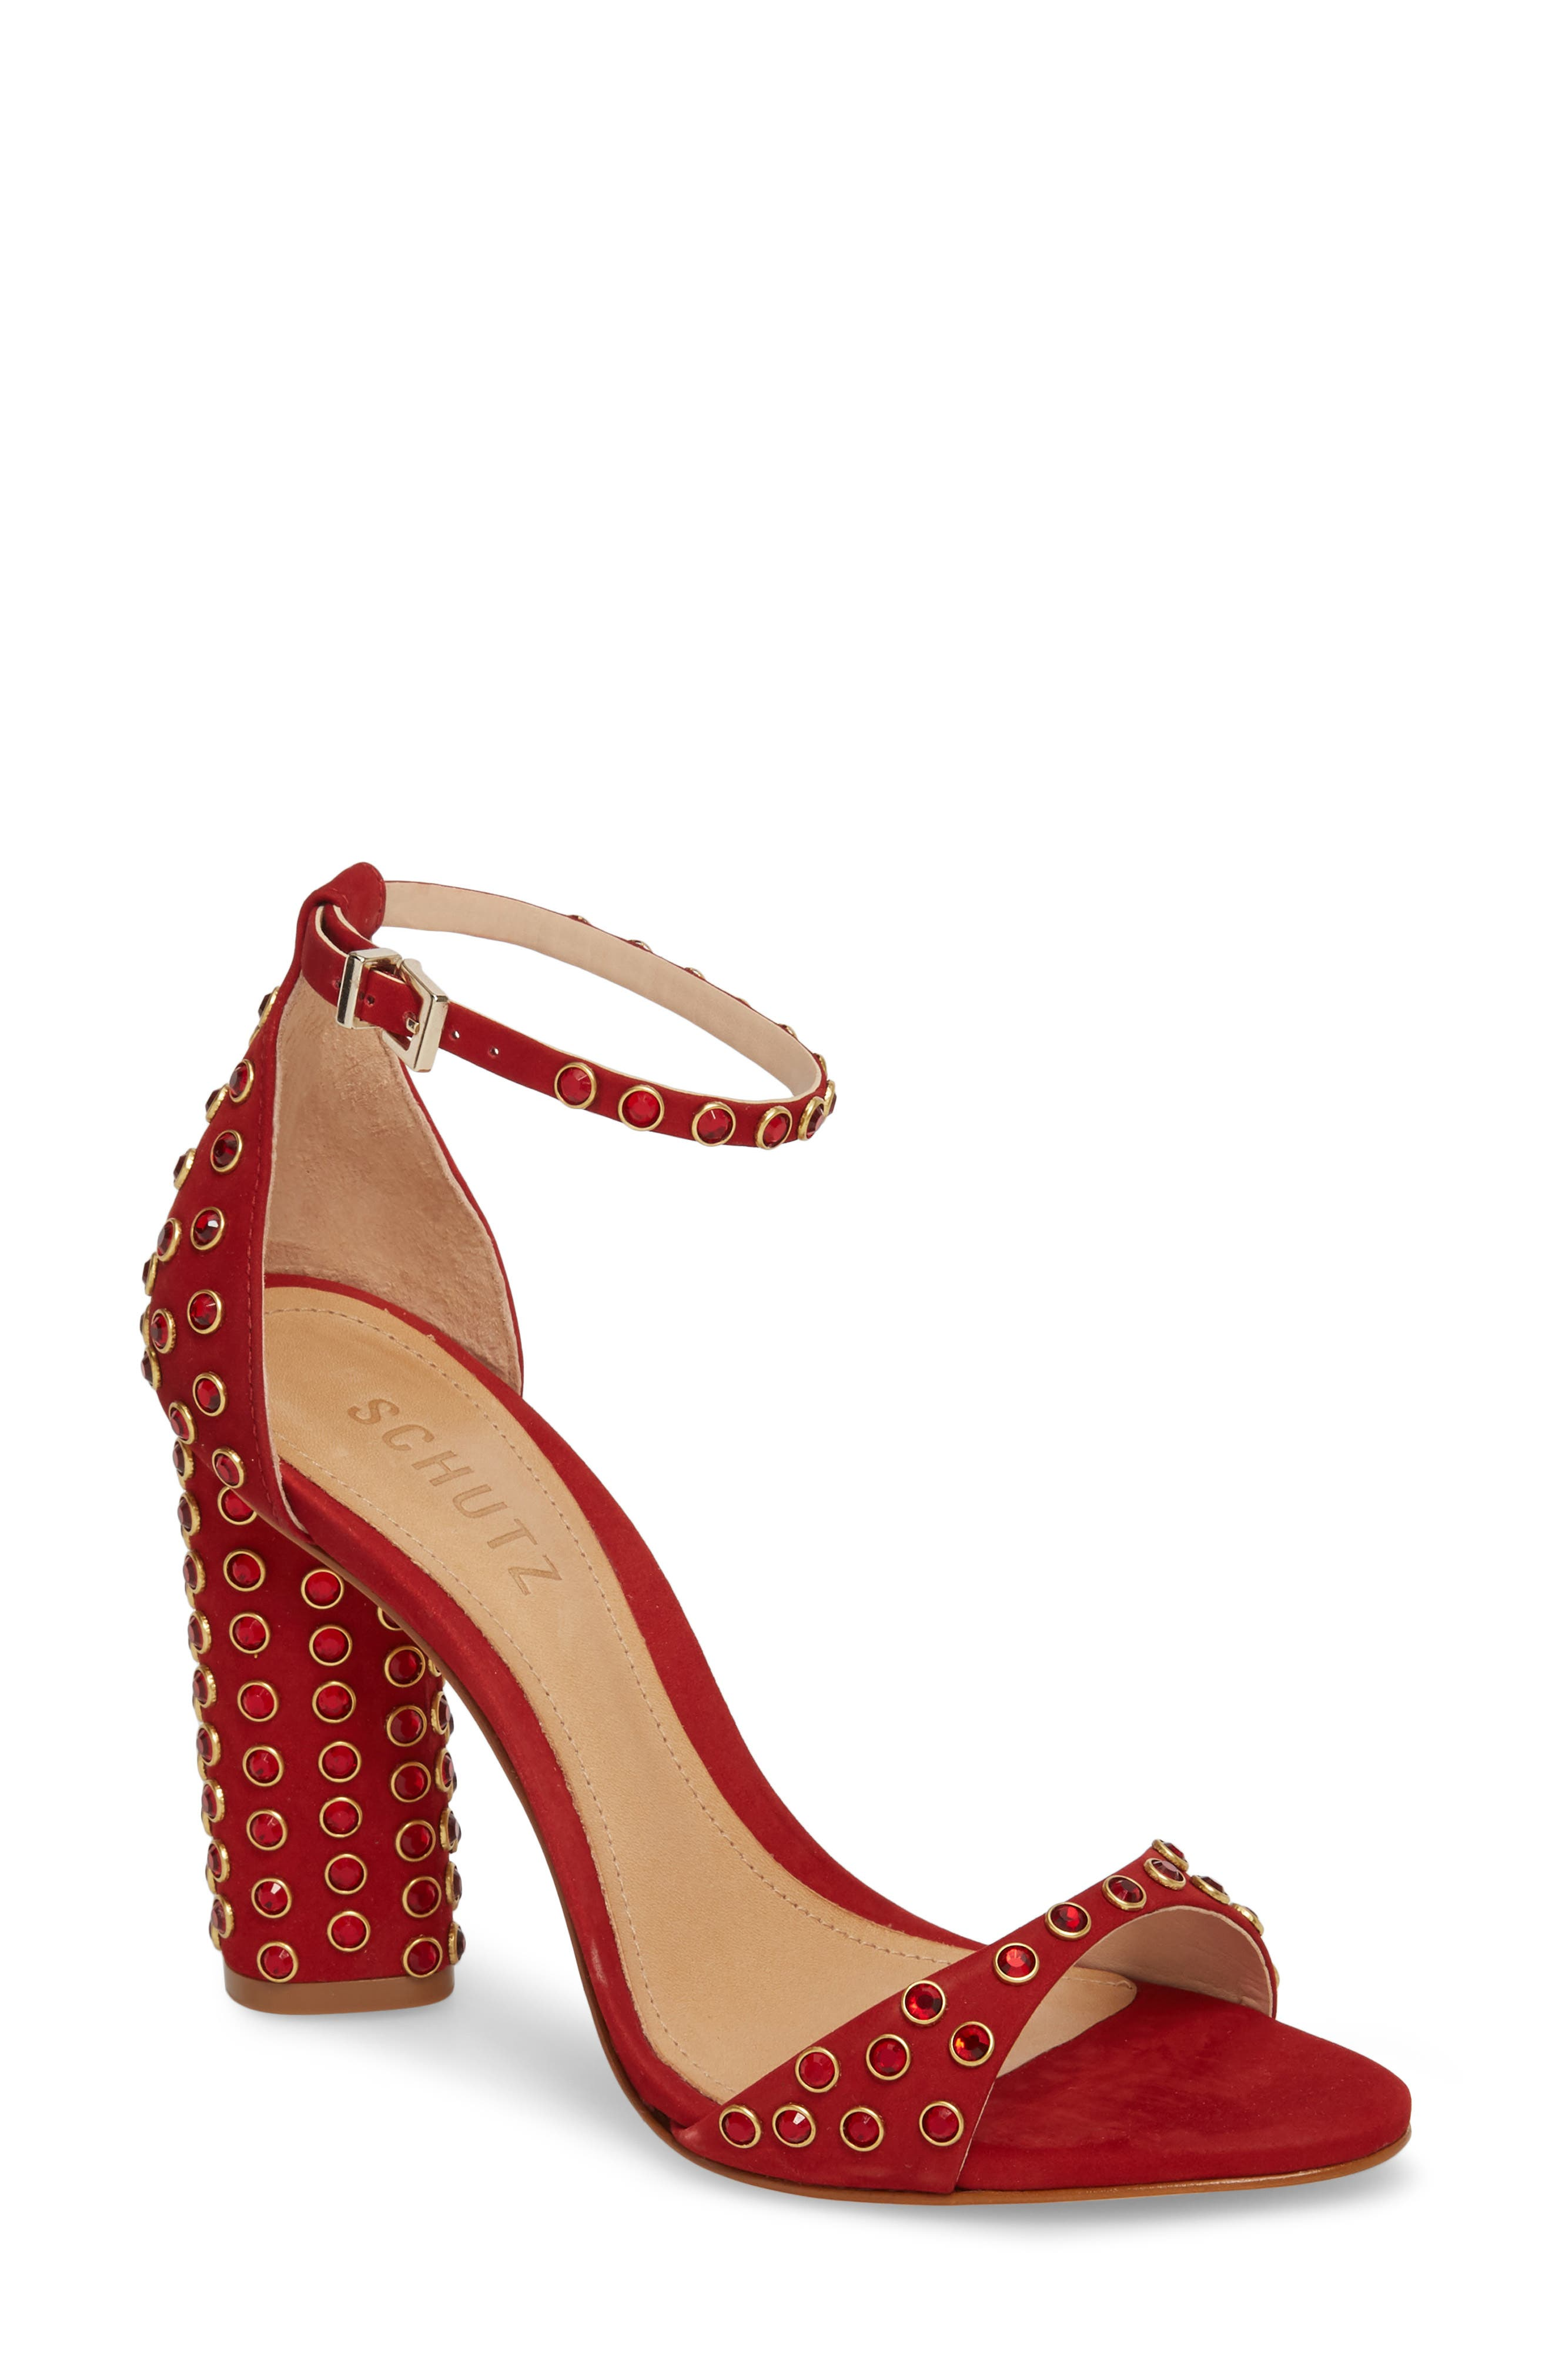 Schutz Marcelle Ankle Strap Sandal- Green